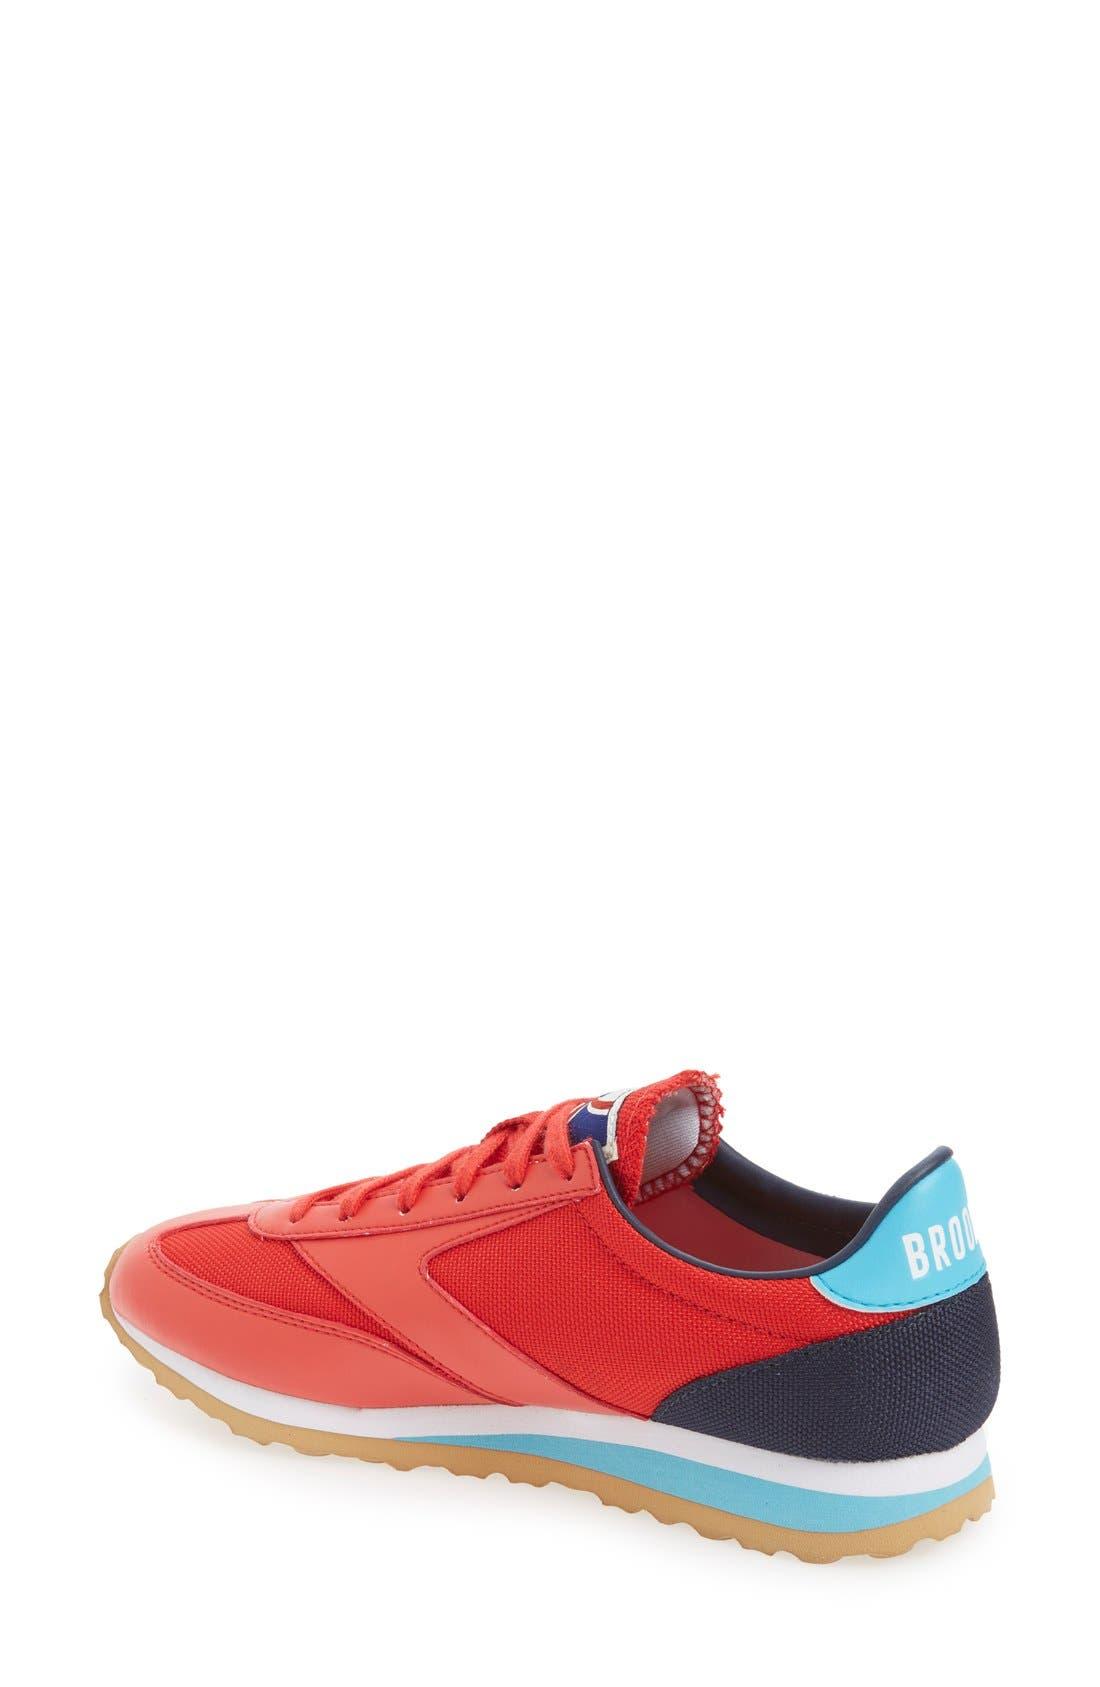 'Vanguard' Sneaker,                             Alternate thumbnail 137, color,